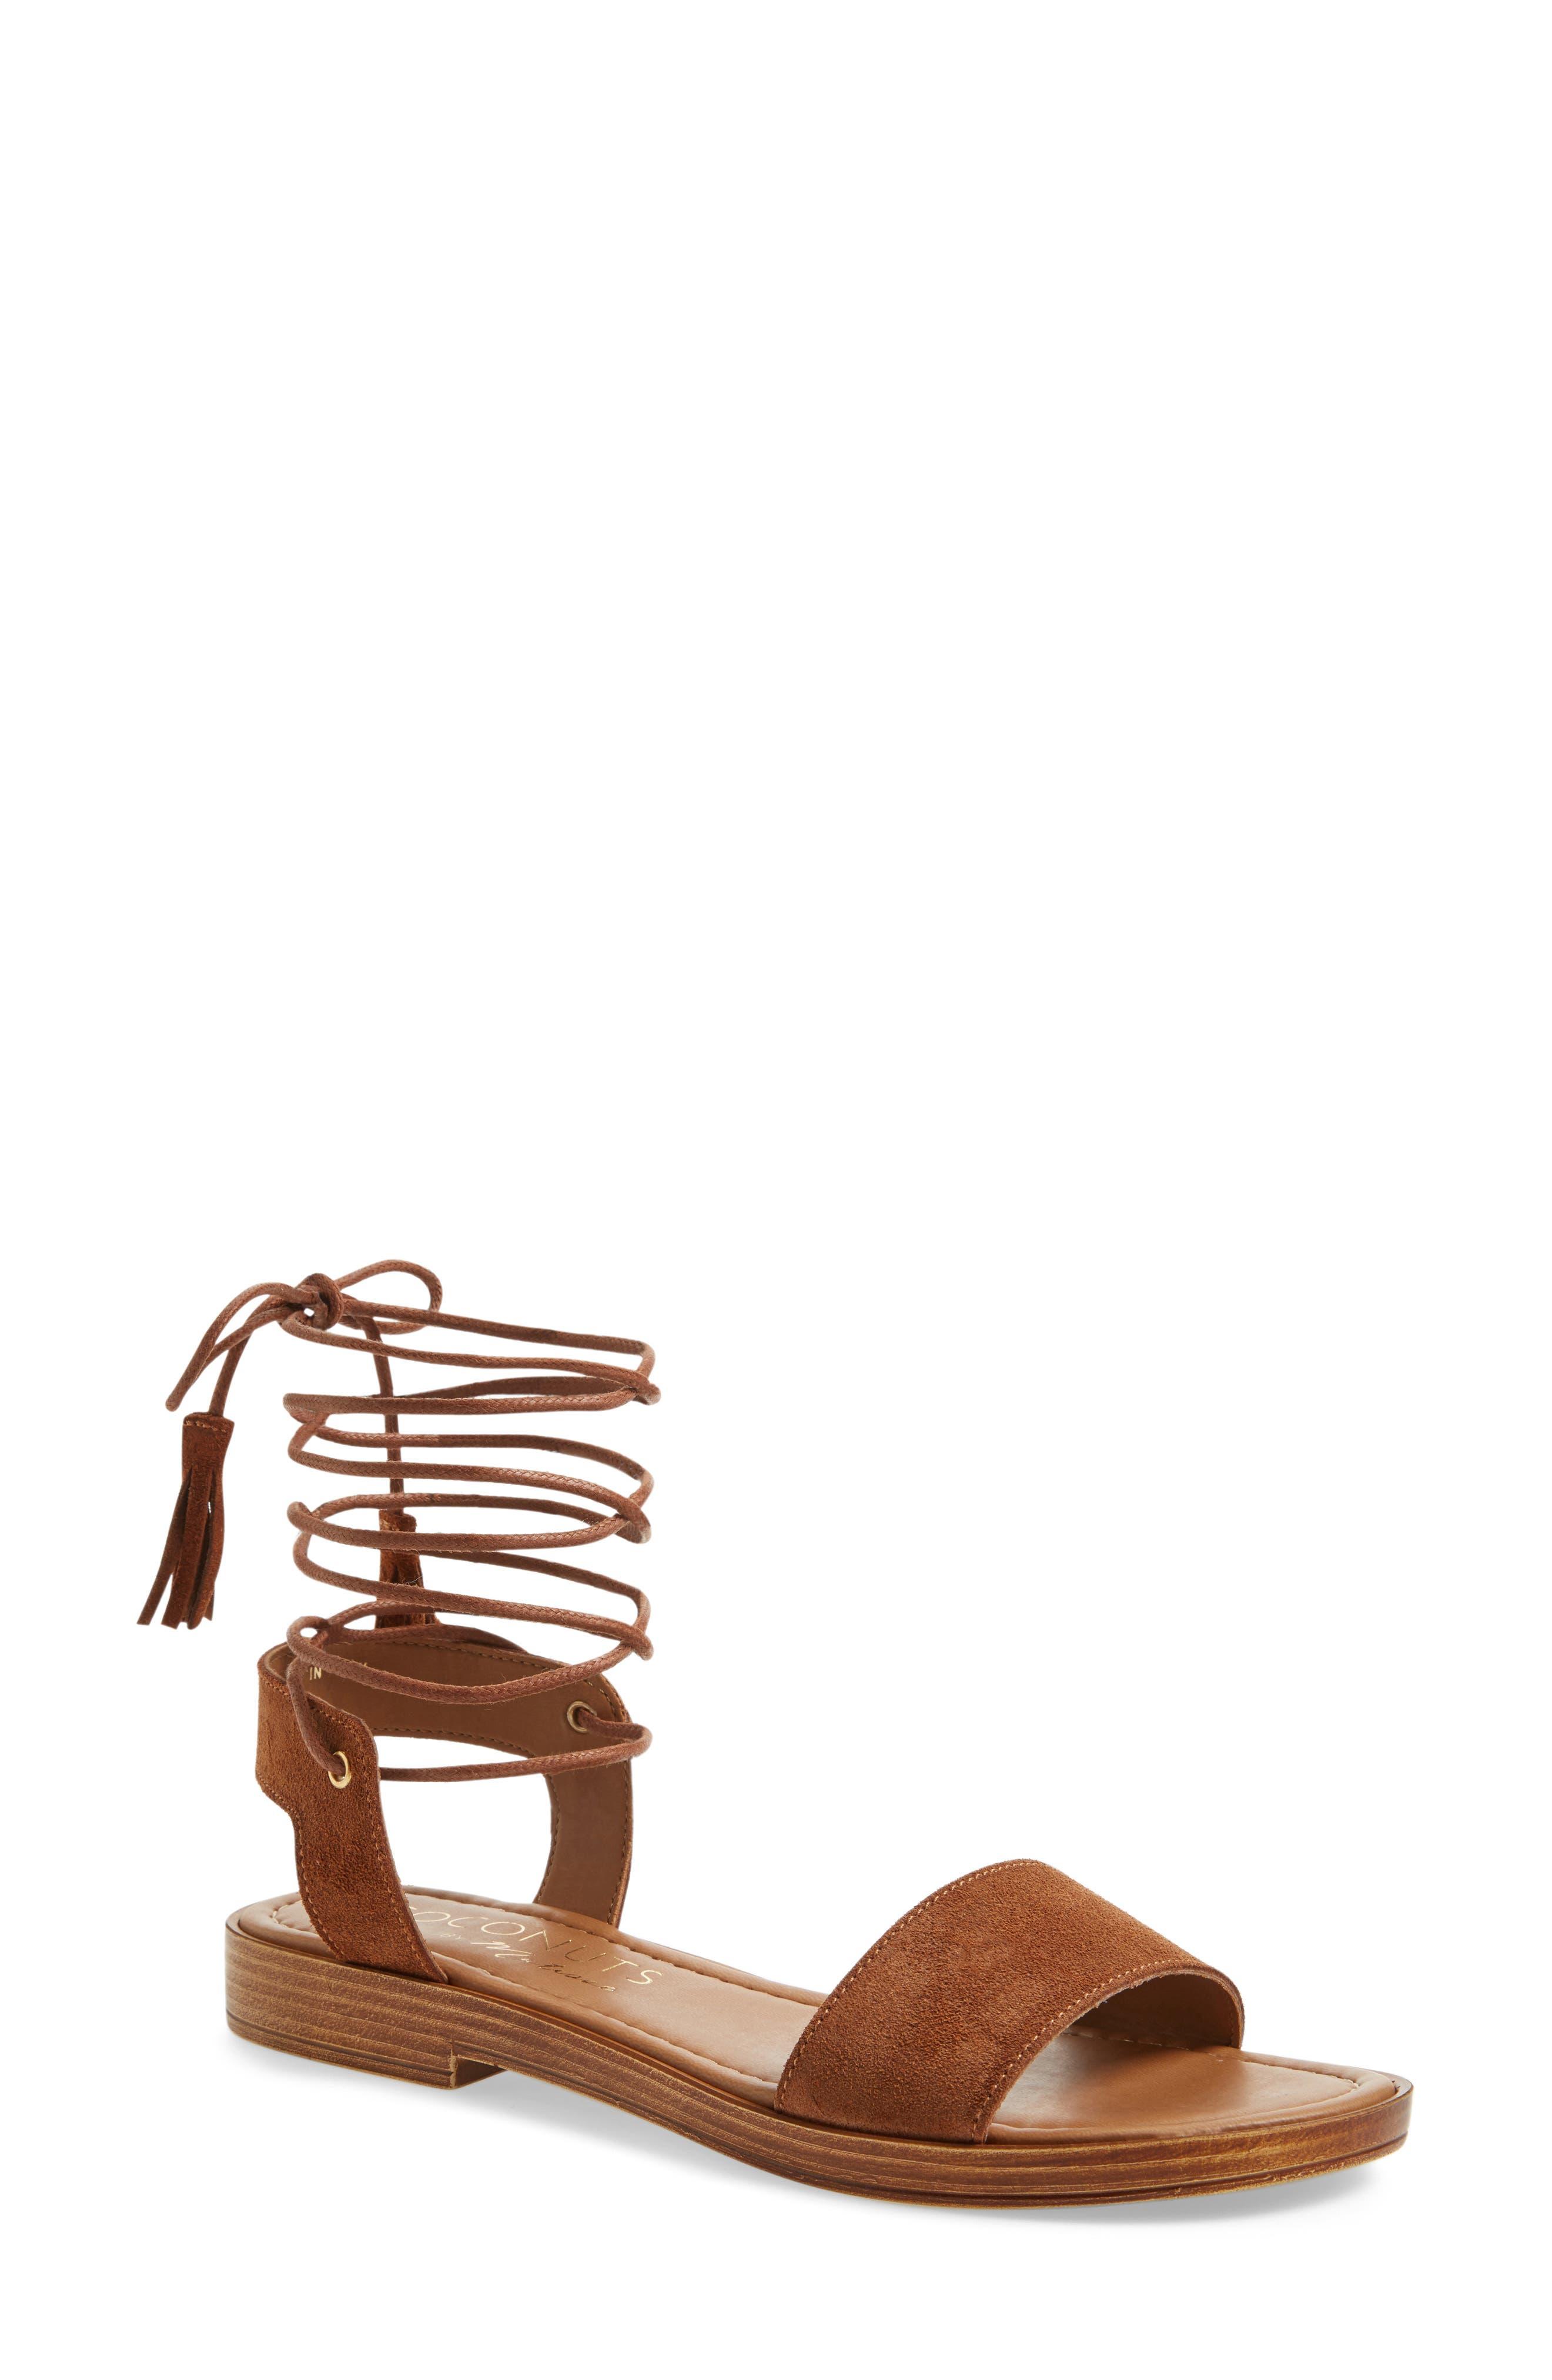 Sting Wraparound Lace Sandal,                             Main thumbnail 1, color,                             Saddle Suede